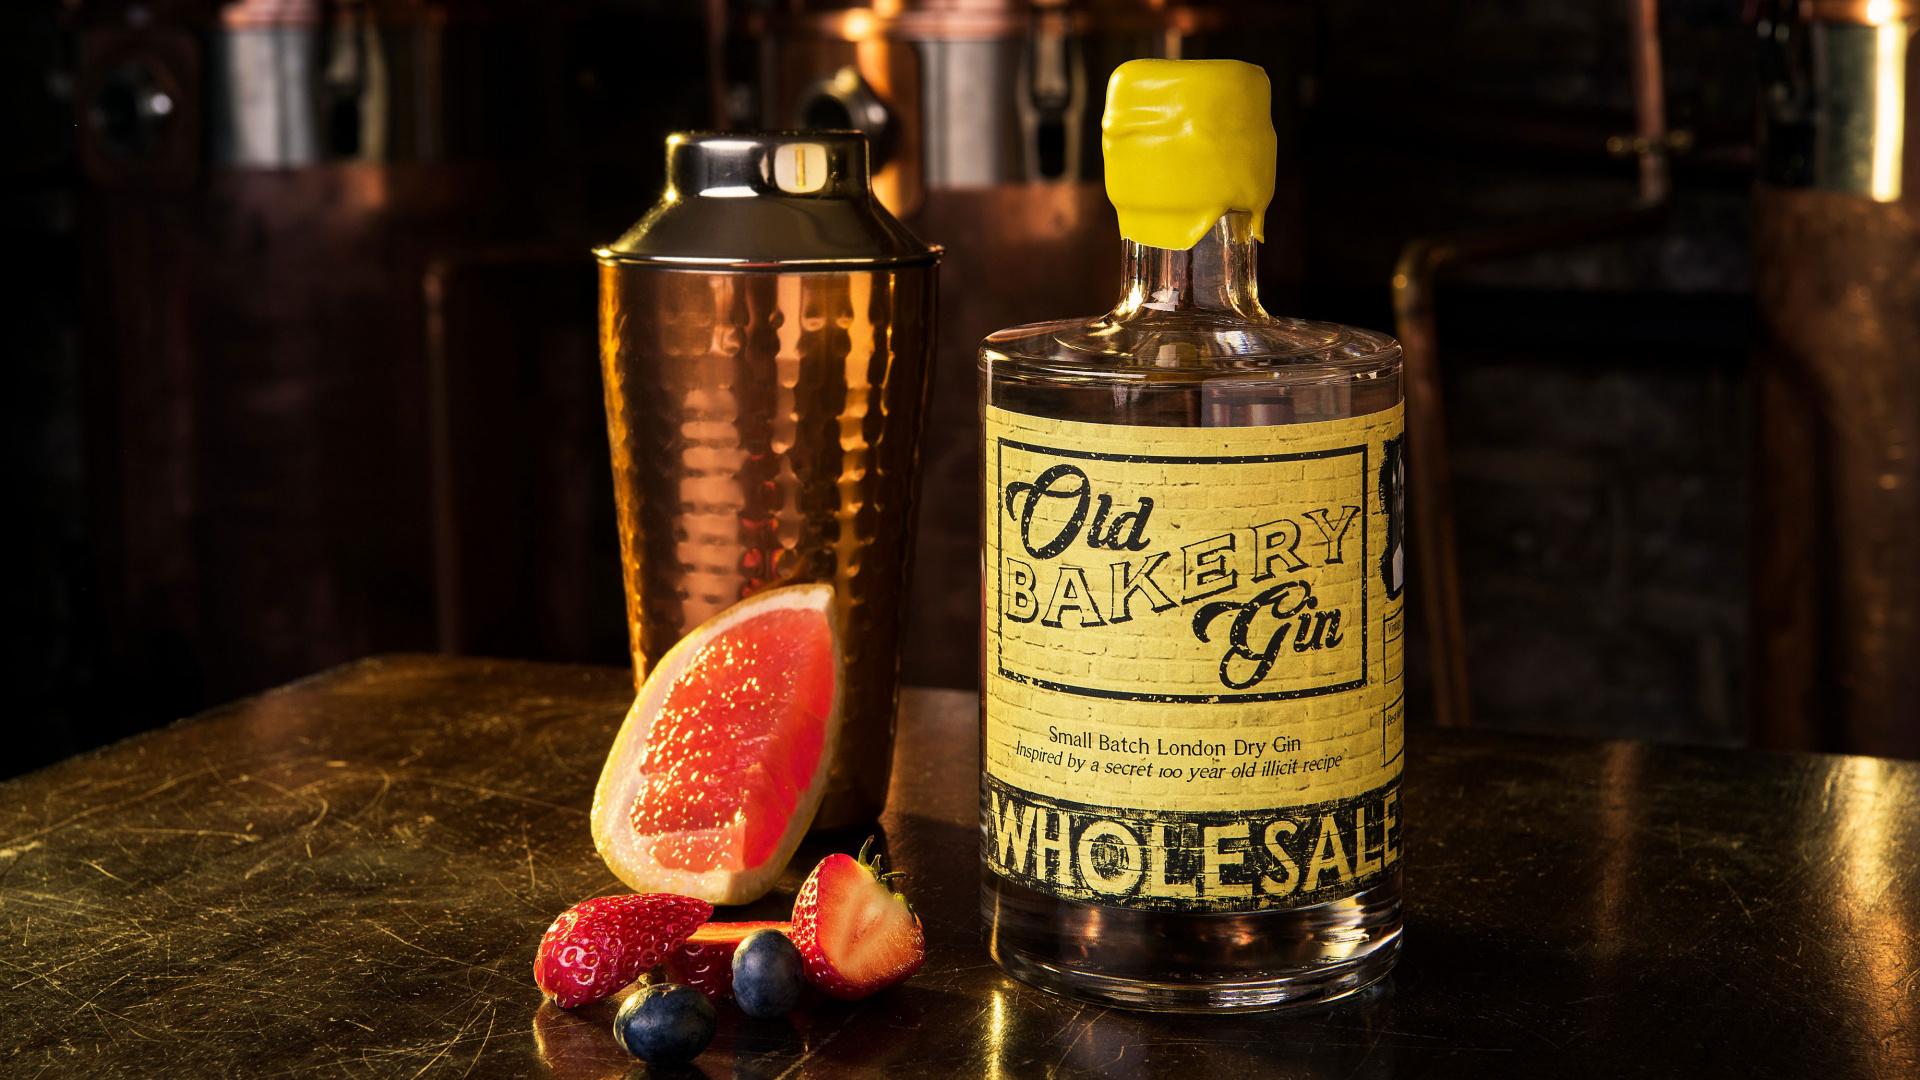 Old Bakery Gin's Black Pepper Gin